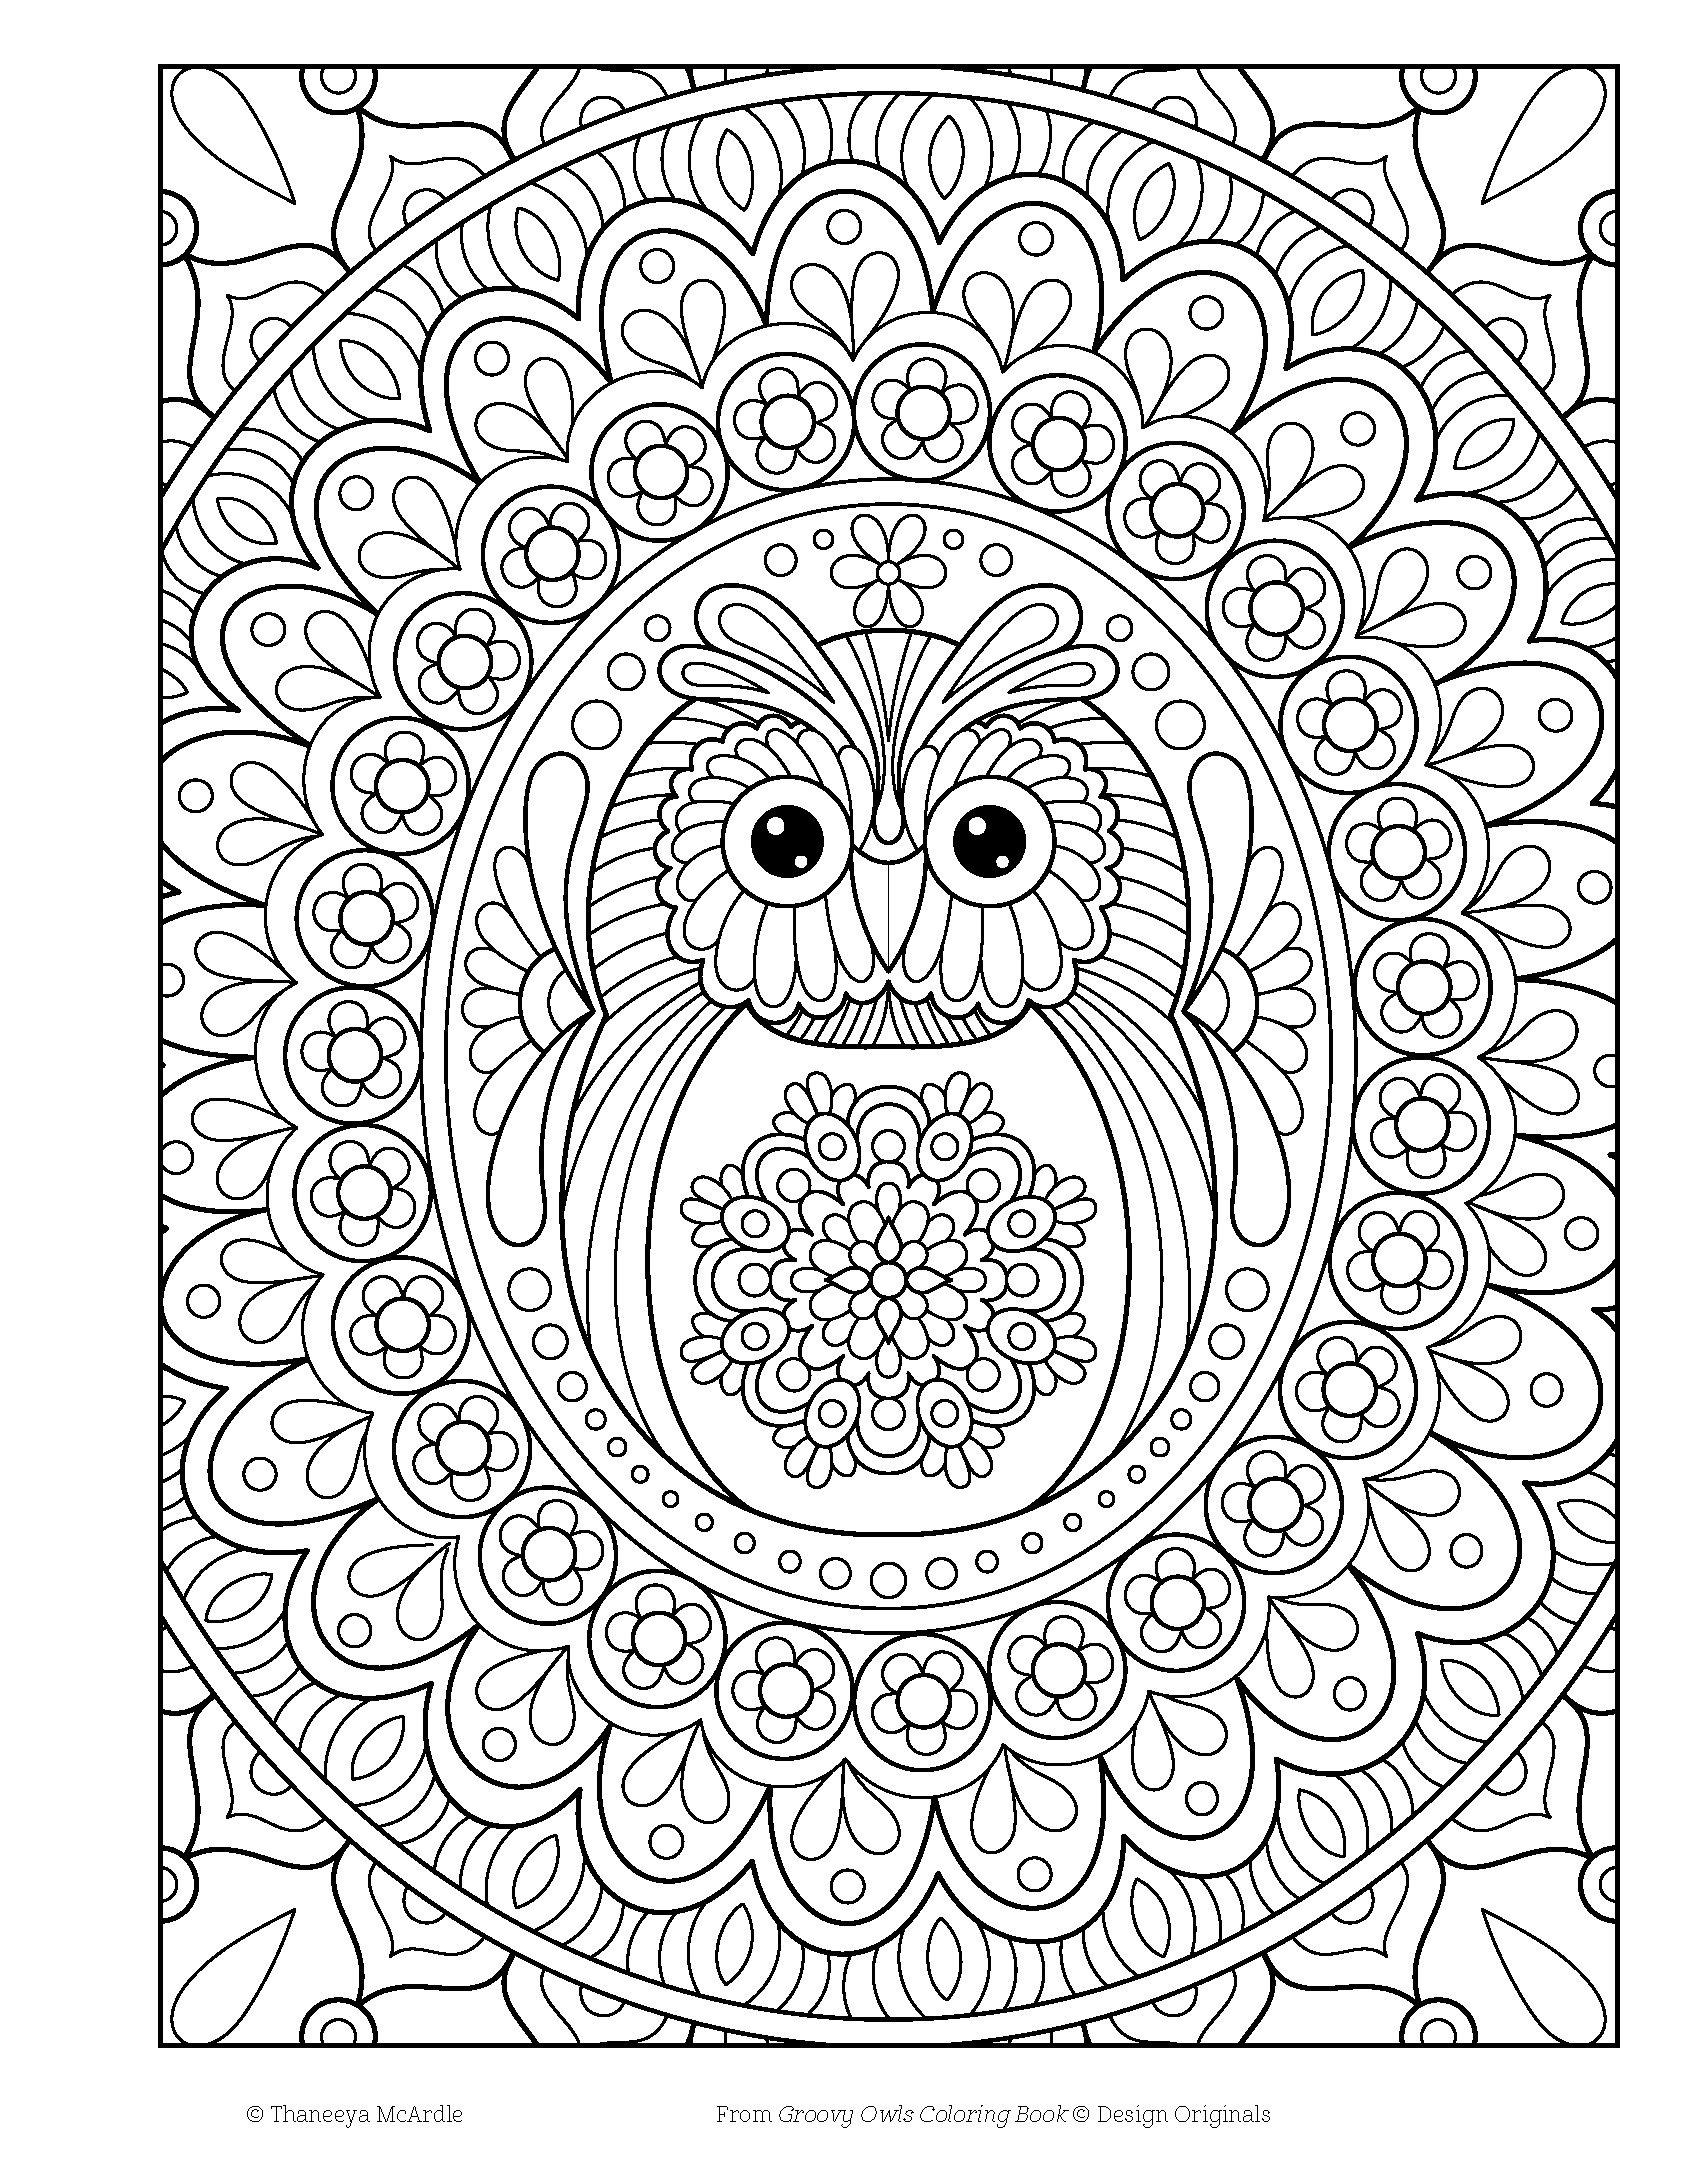 Amazon Groovy Owls Coloring Book Is Fun Design Originals 9781497202078 Thaneeya McArdle Books